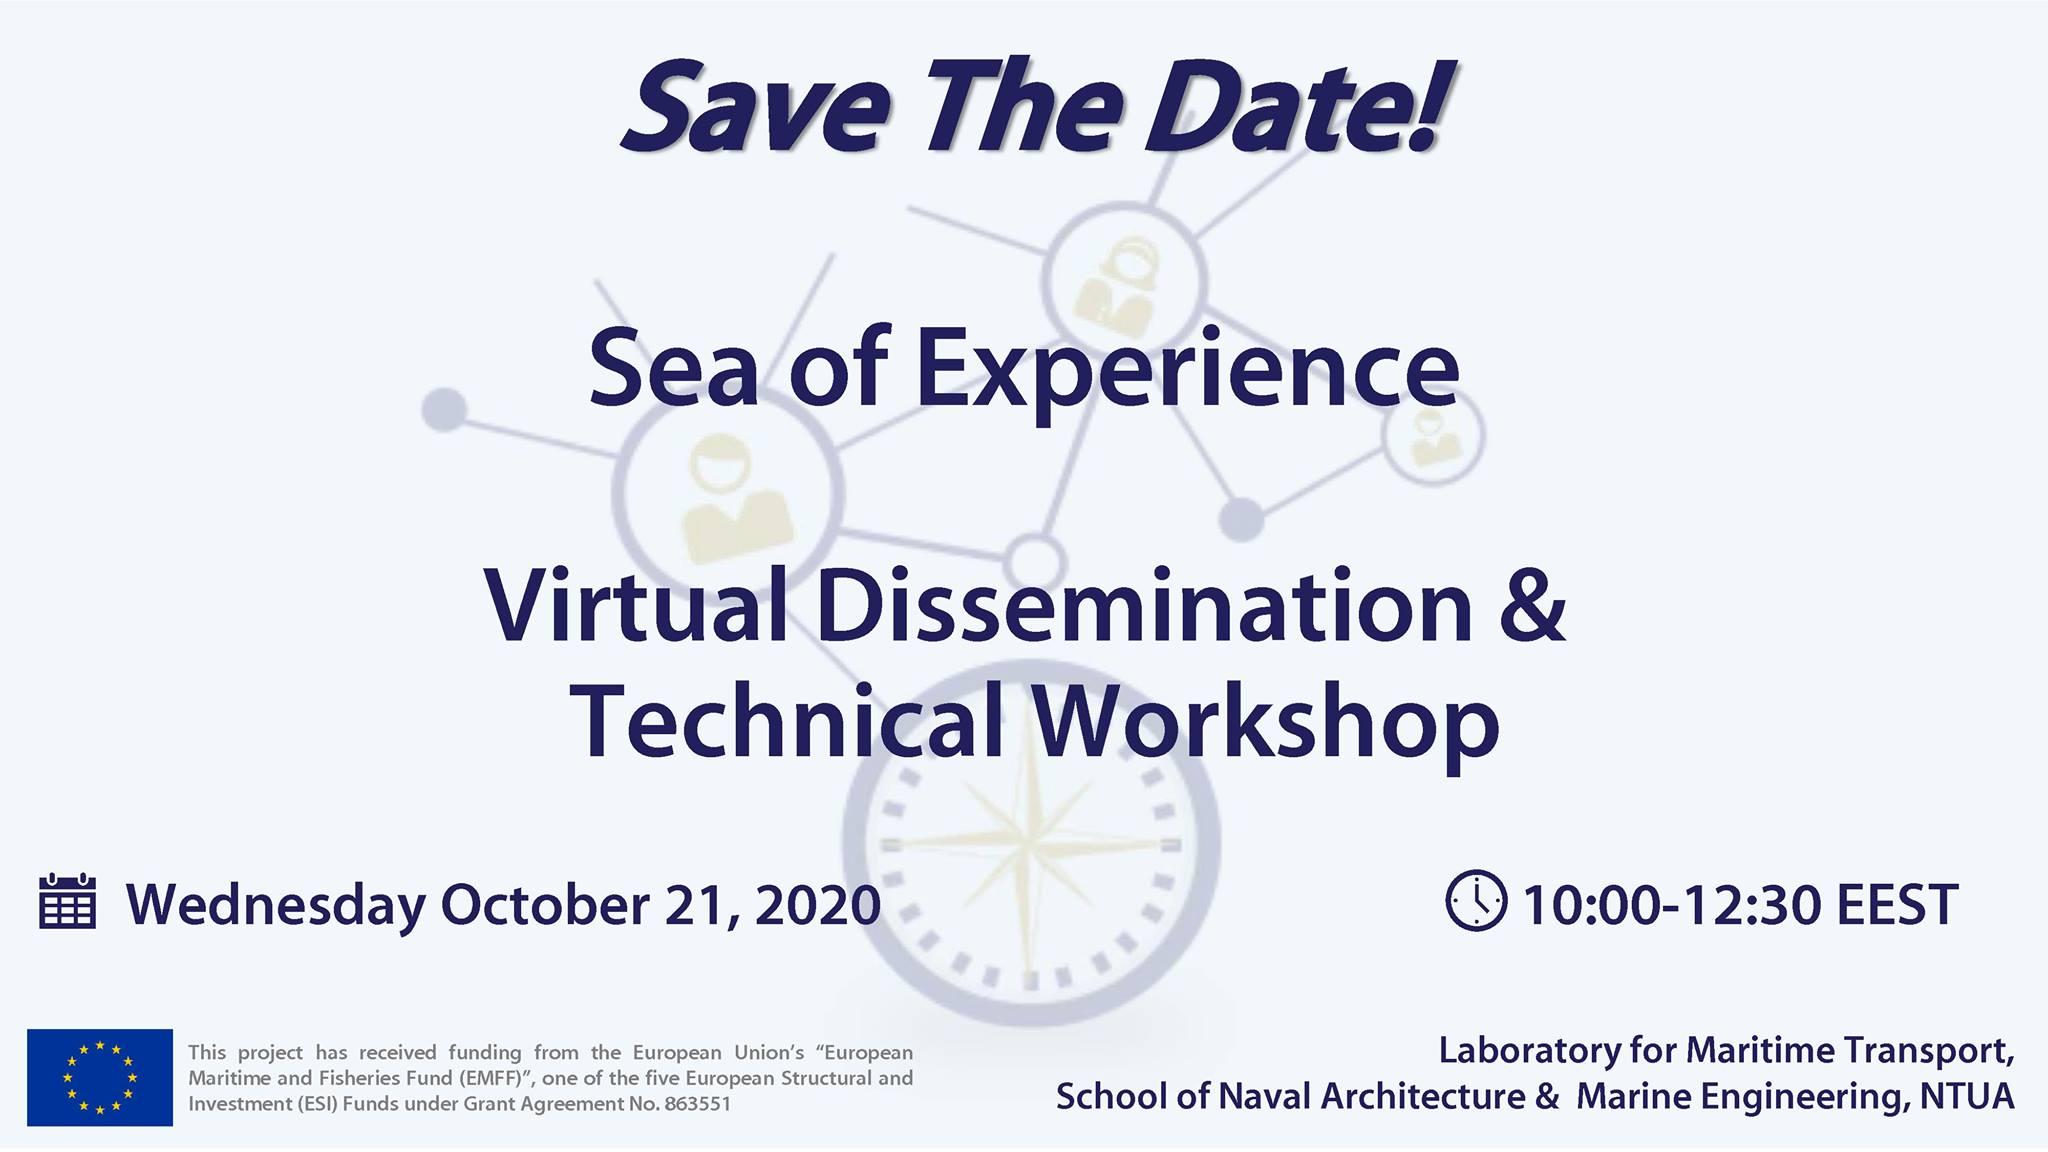 SoE Virtual Dissemination & Technical Workshop